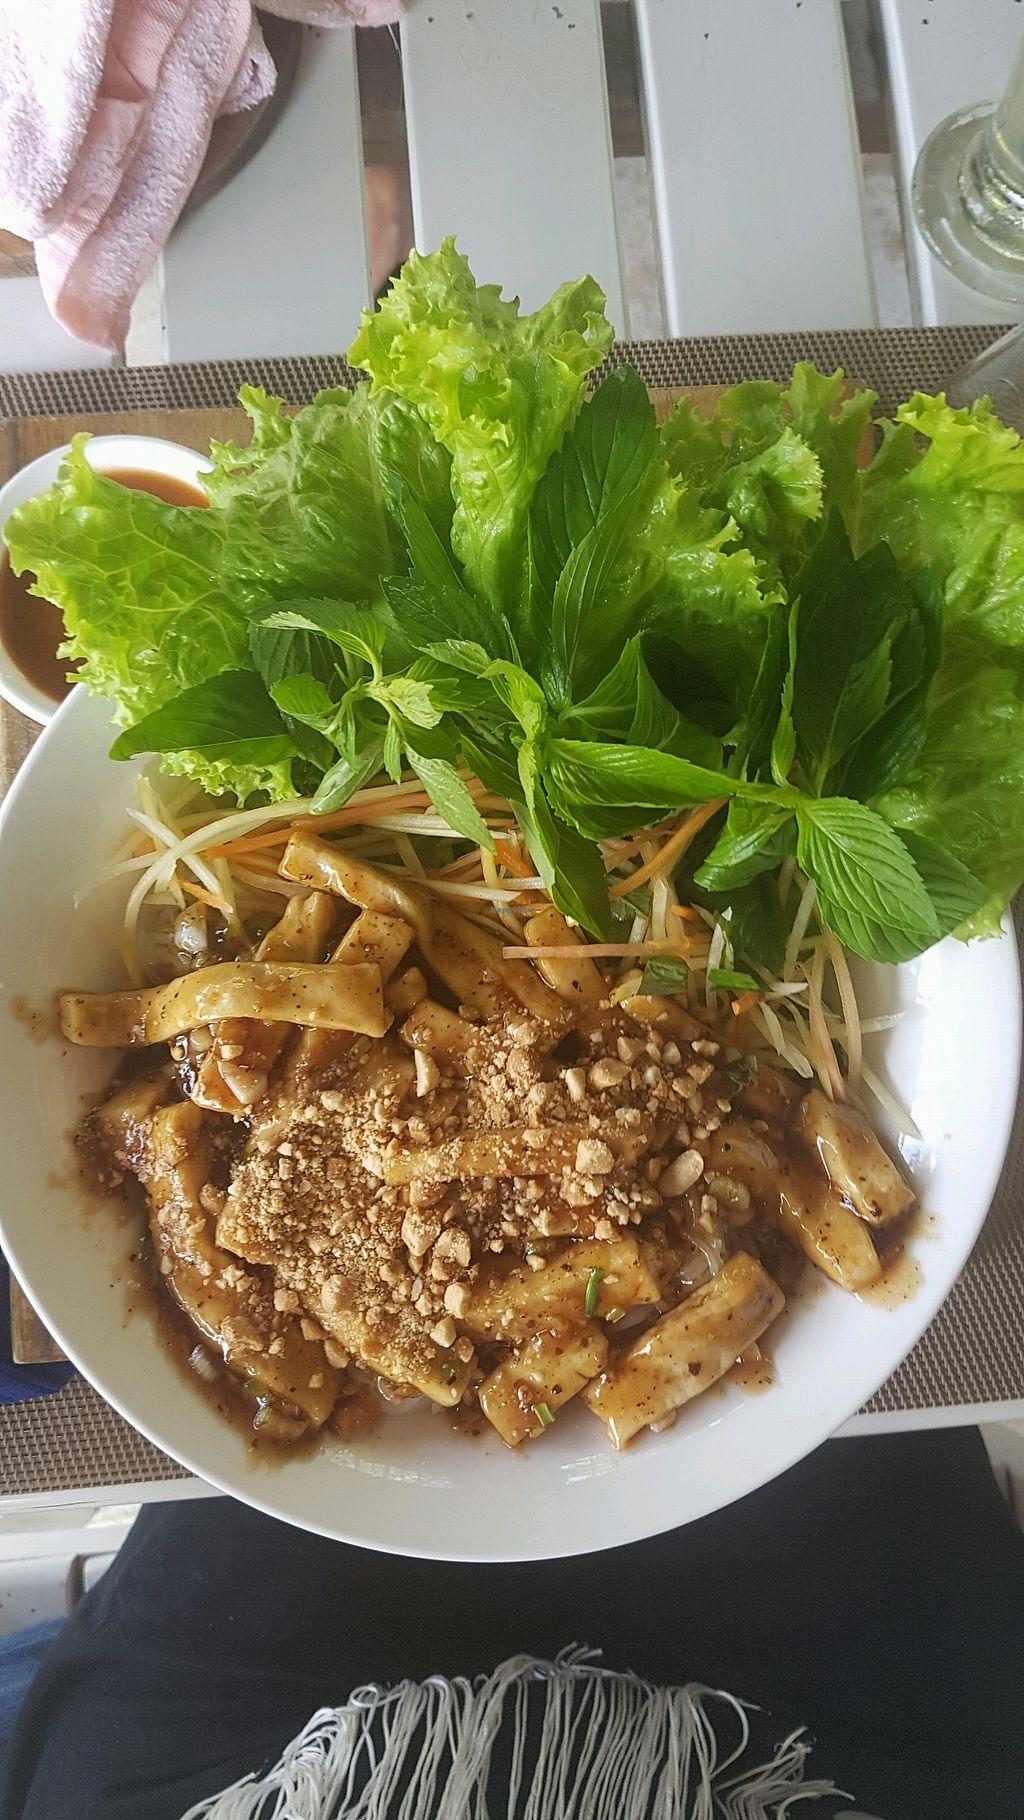 "Photo of Mai Jo Fusion  by <a href=""/members/profile/JeniferProchnow"">JeniferProchnow</a> <br/>Caramelized tofu with fresh ricenoodels <br/> March 4, 2018  - <a href='/contact/abuse/image/106890/366560'>Report</a>"